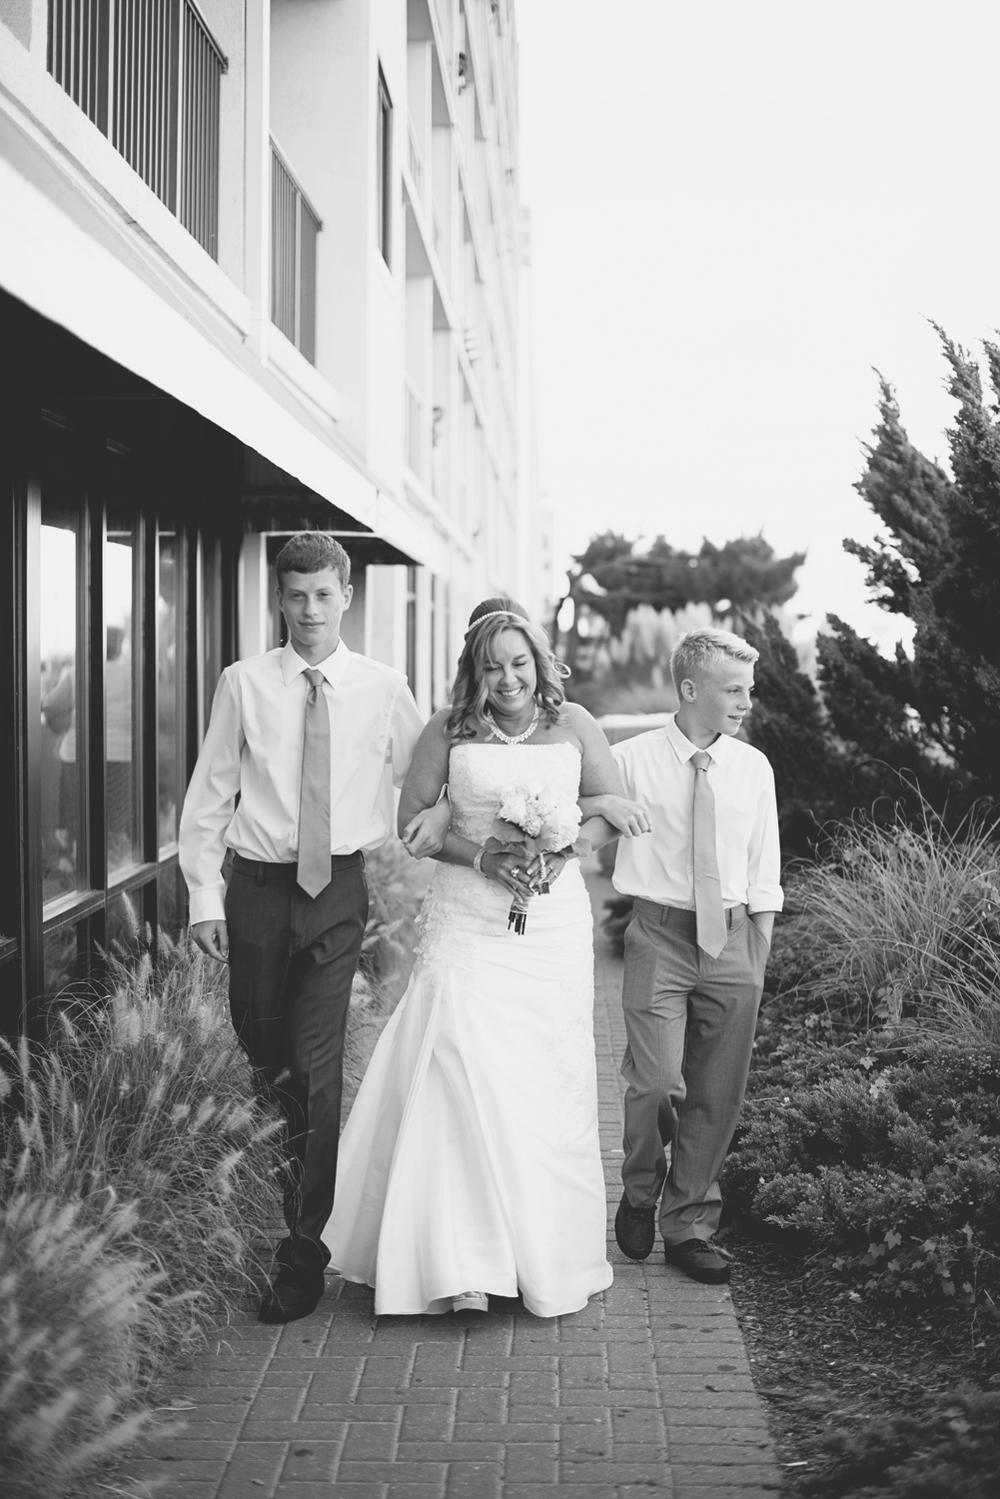 Virginia Beach Oceanfront Wedding | Bride walking down the aisle